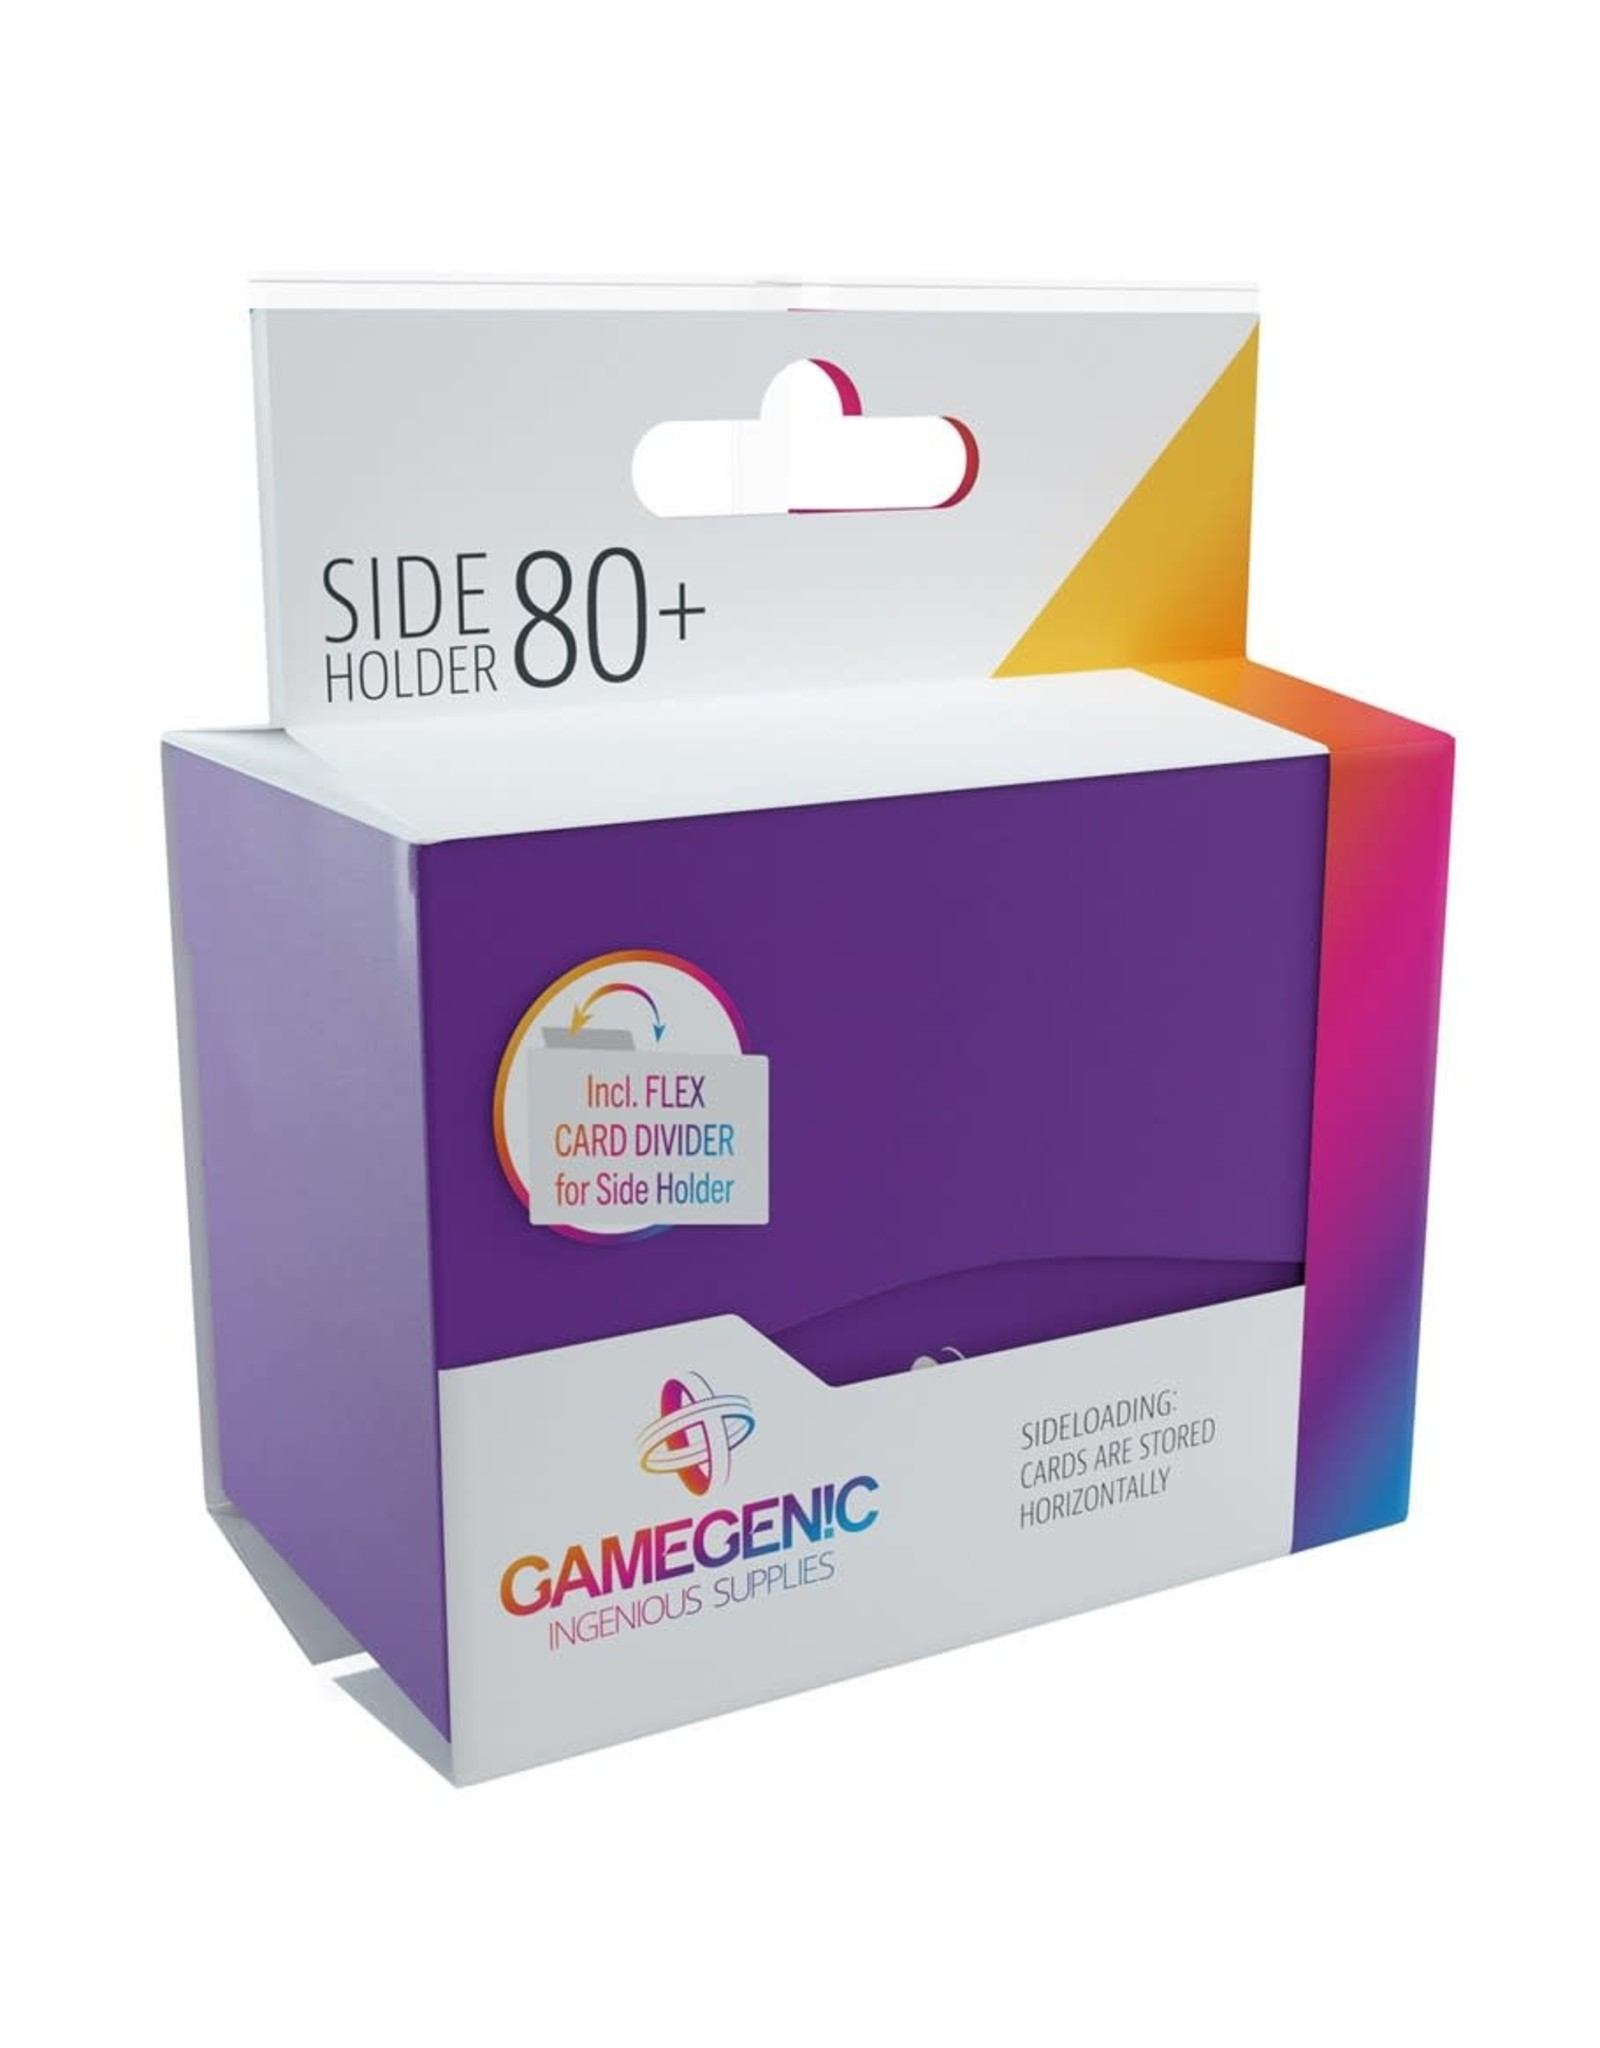 GameGenic DB: Side Holder 80+ PU